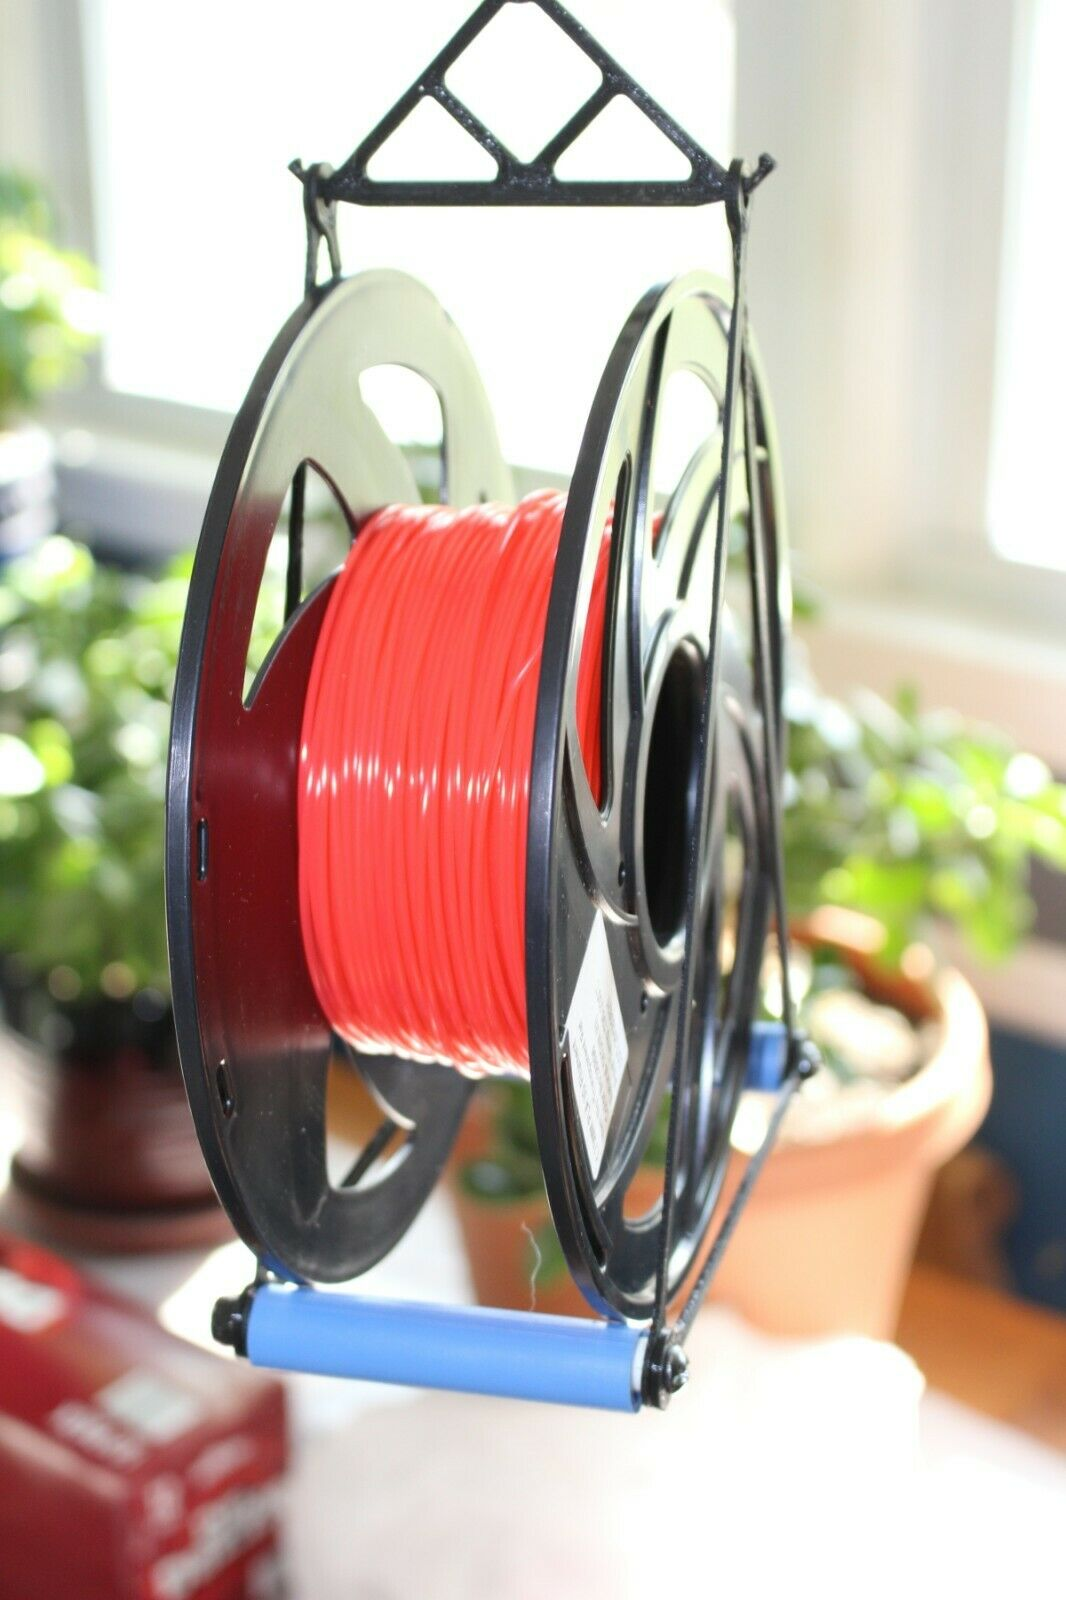 (Qty: 2) 3D Printer Spool Holder - Standard 1KG spools - Precision Bearings